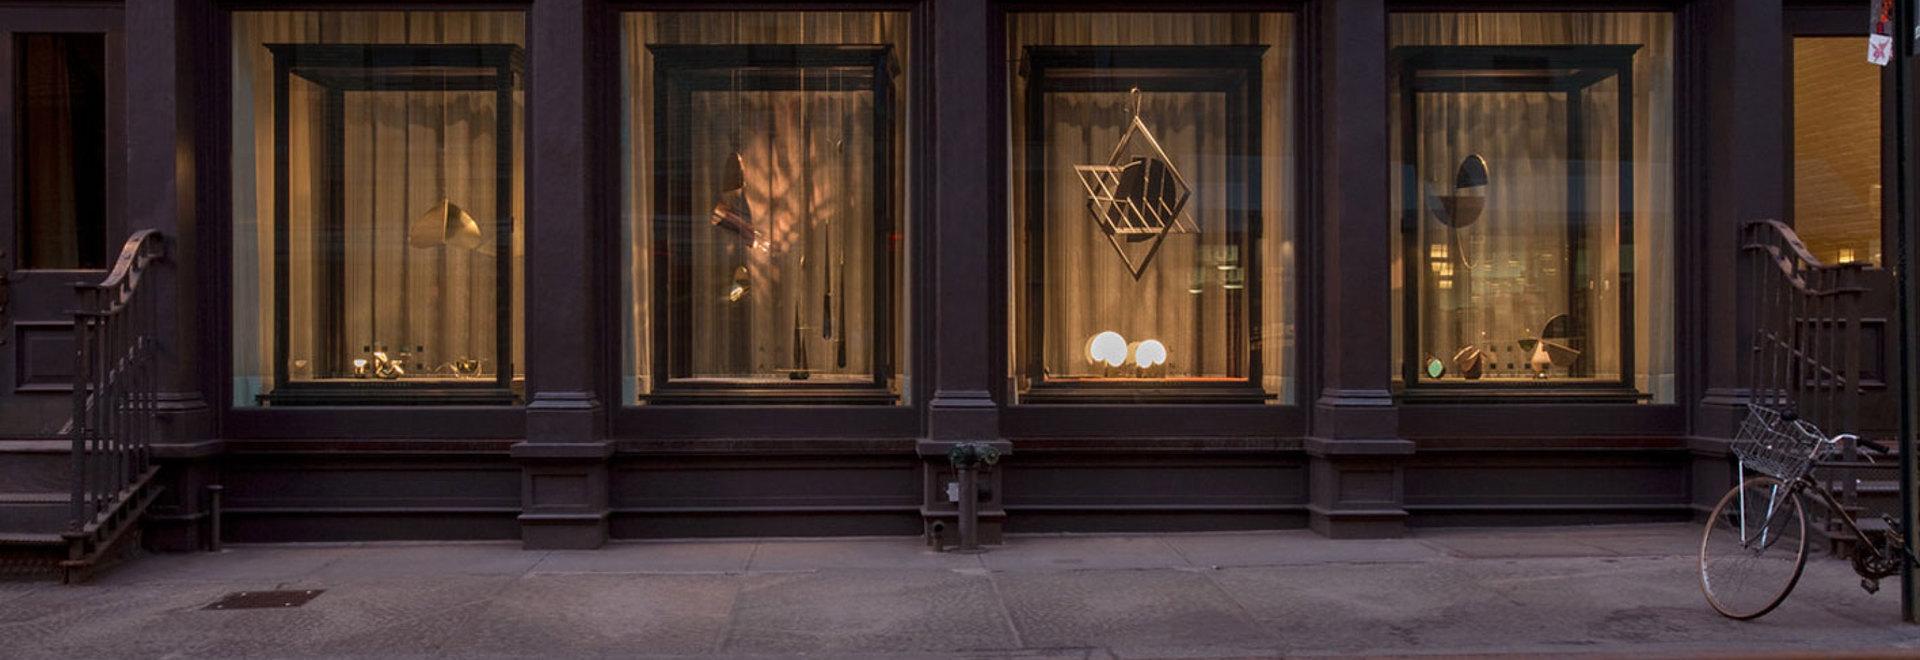 Brooklyn-based designer Karl Zahn is showcasing an assortment of new work in the shopfront of custom hardware manufacturer E.R. Butler & Co in New York